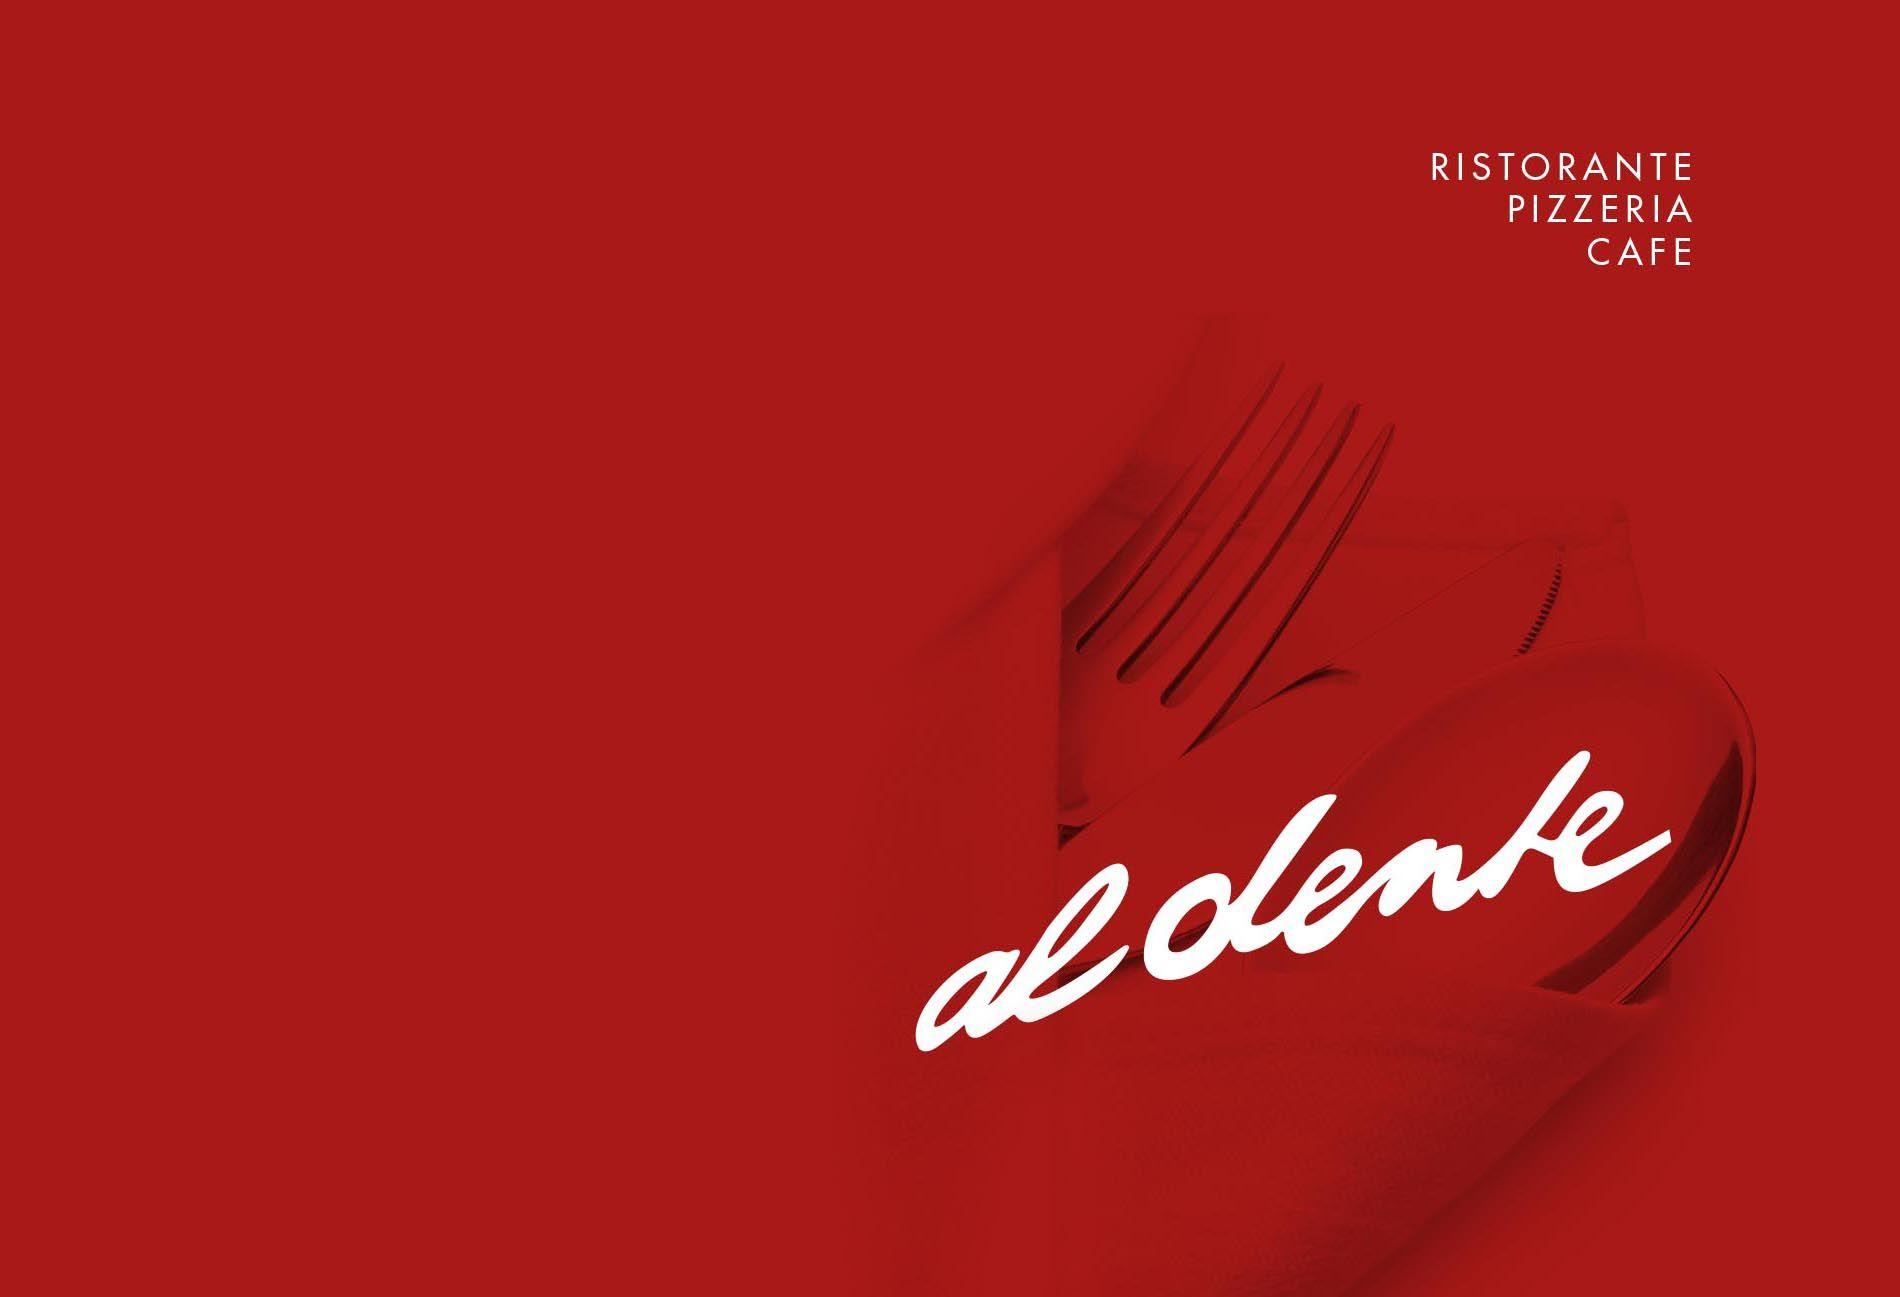 Ristorante Pizzeria Al Dente Chieming Am Chiemsee Speisekarte In 2020 Online Angebote Pizzeria Speisekarte